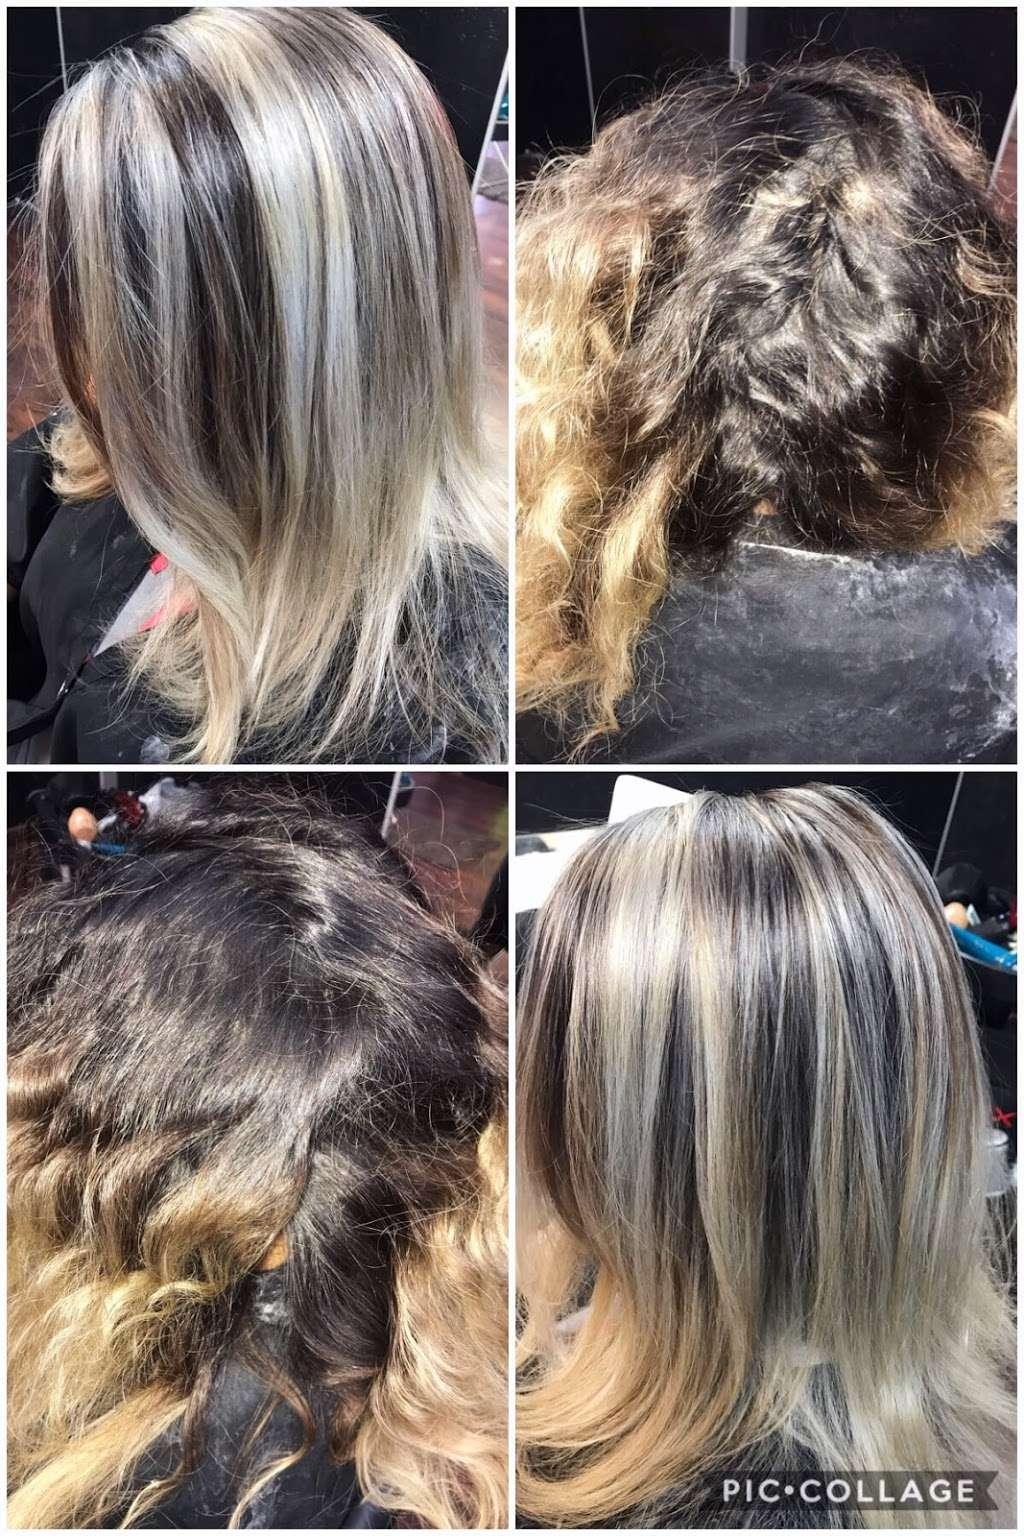 Jan Fher Hair Designer studio - hair care    Photo 9 of 10   Address: 842 S Galloway Ave, Mesquite, TX 75149, USA   Phone: (972) 322-9373